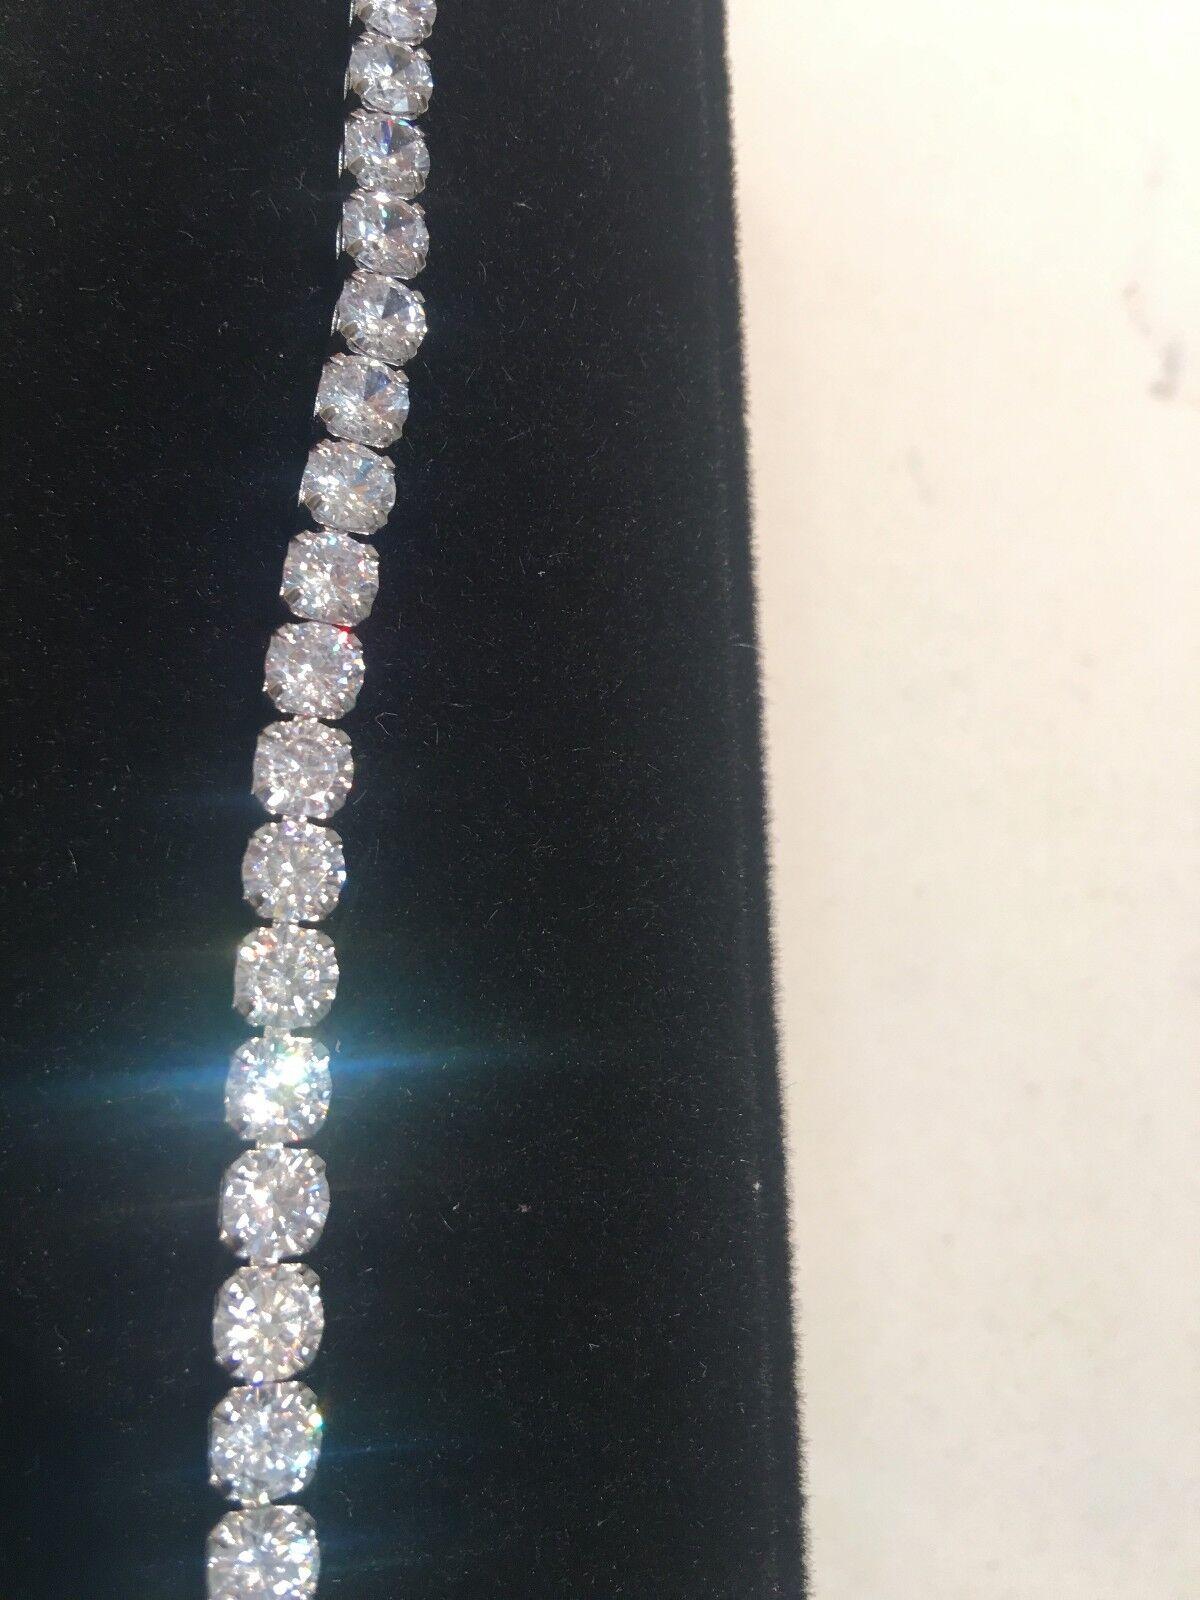 10Ct Diamond Tennis Bracelet 6.75  1 Row Round Diamonds perfect 14K White goldep